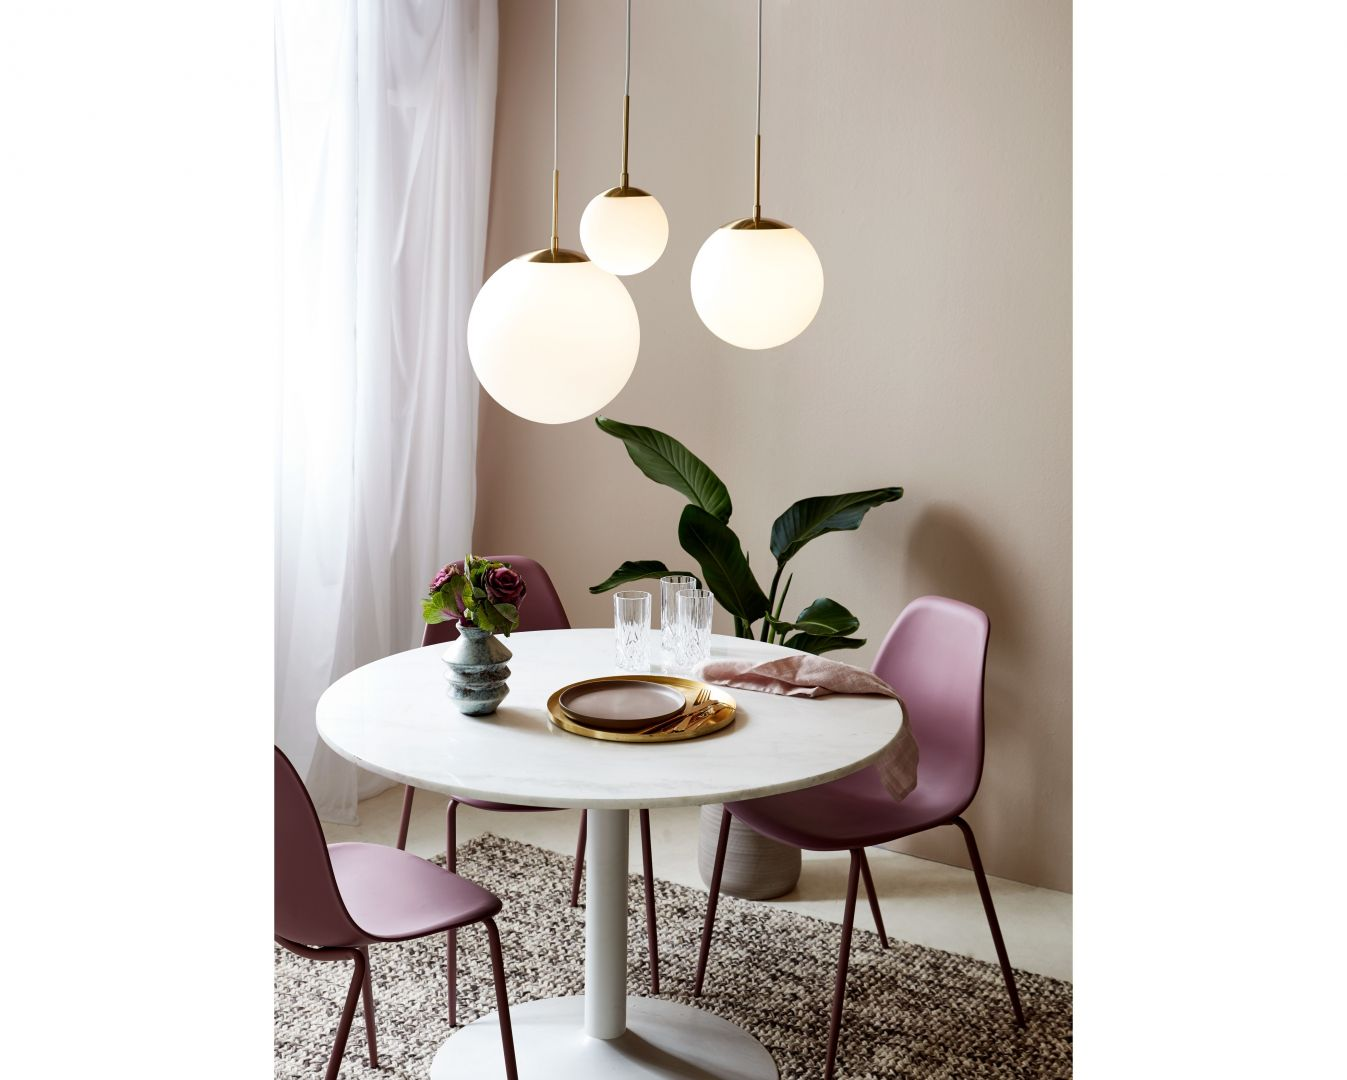 Lampy wiszące Grant z oferty marki Nordlux. Fot. Ardant